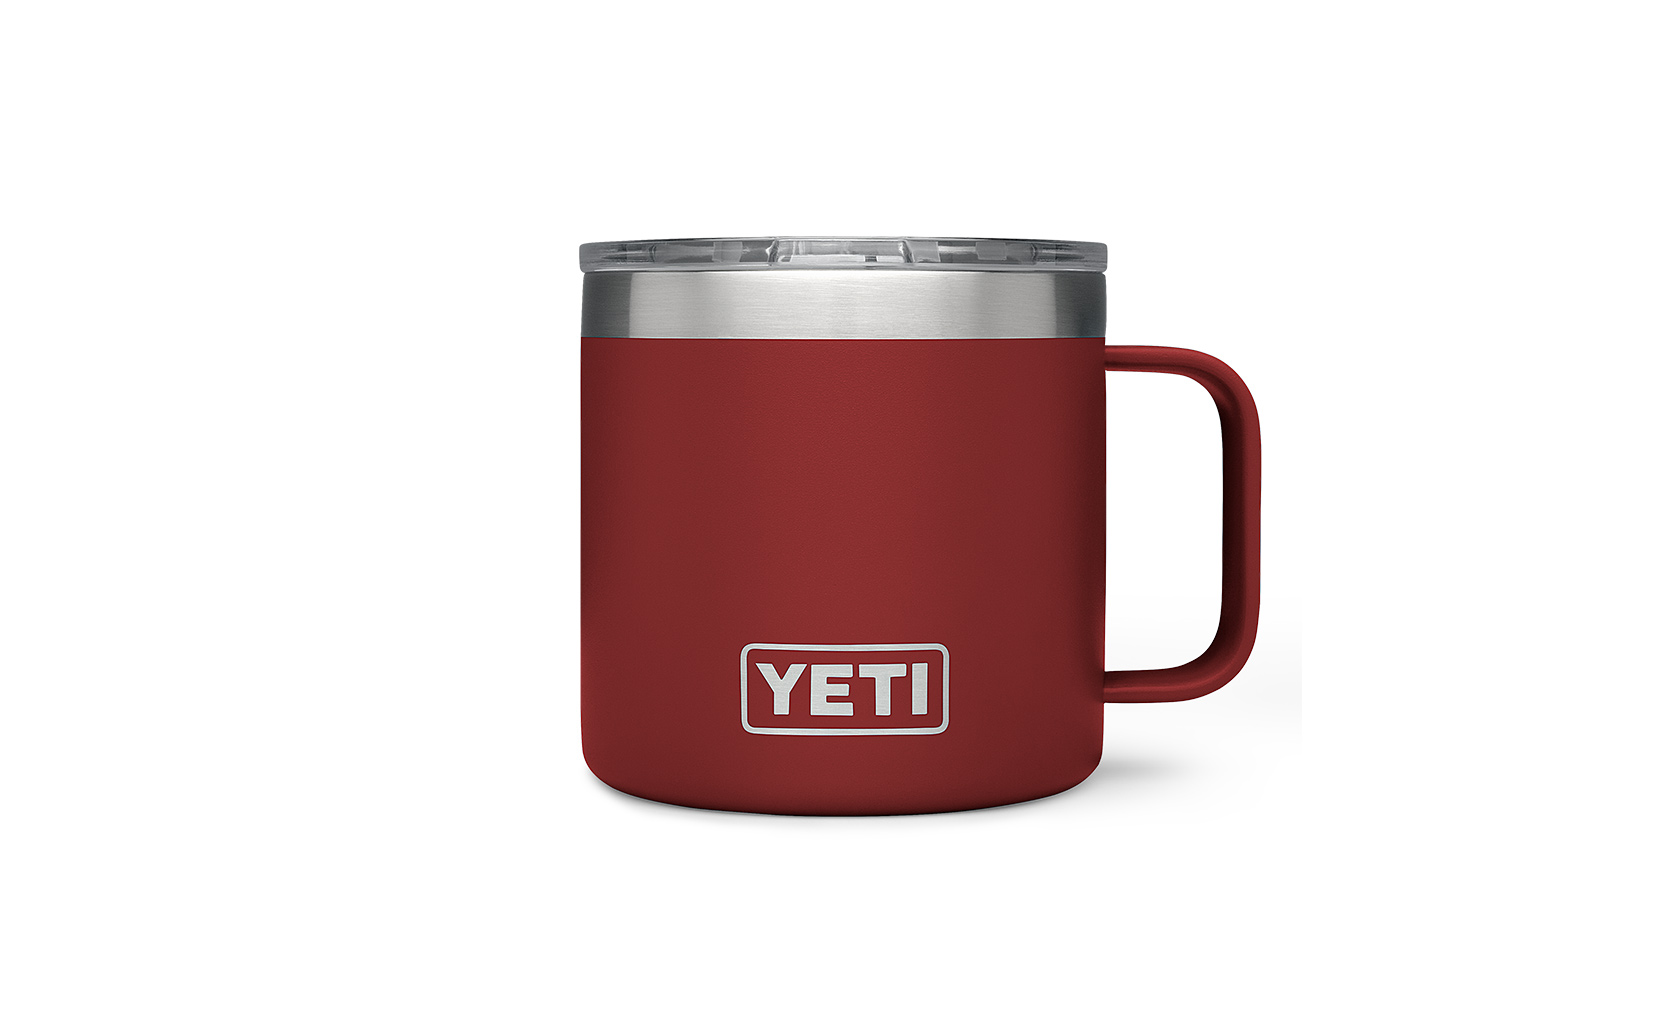 Yeti 14 oz mug red